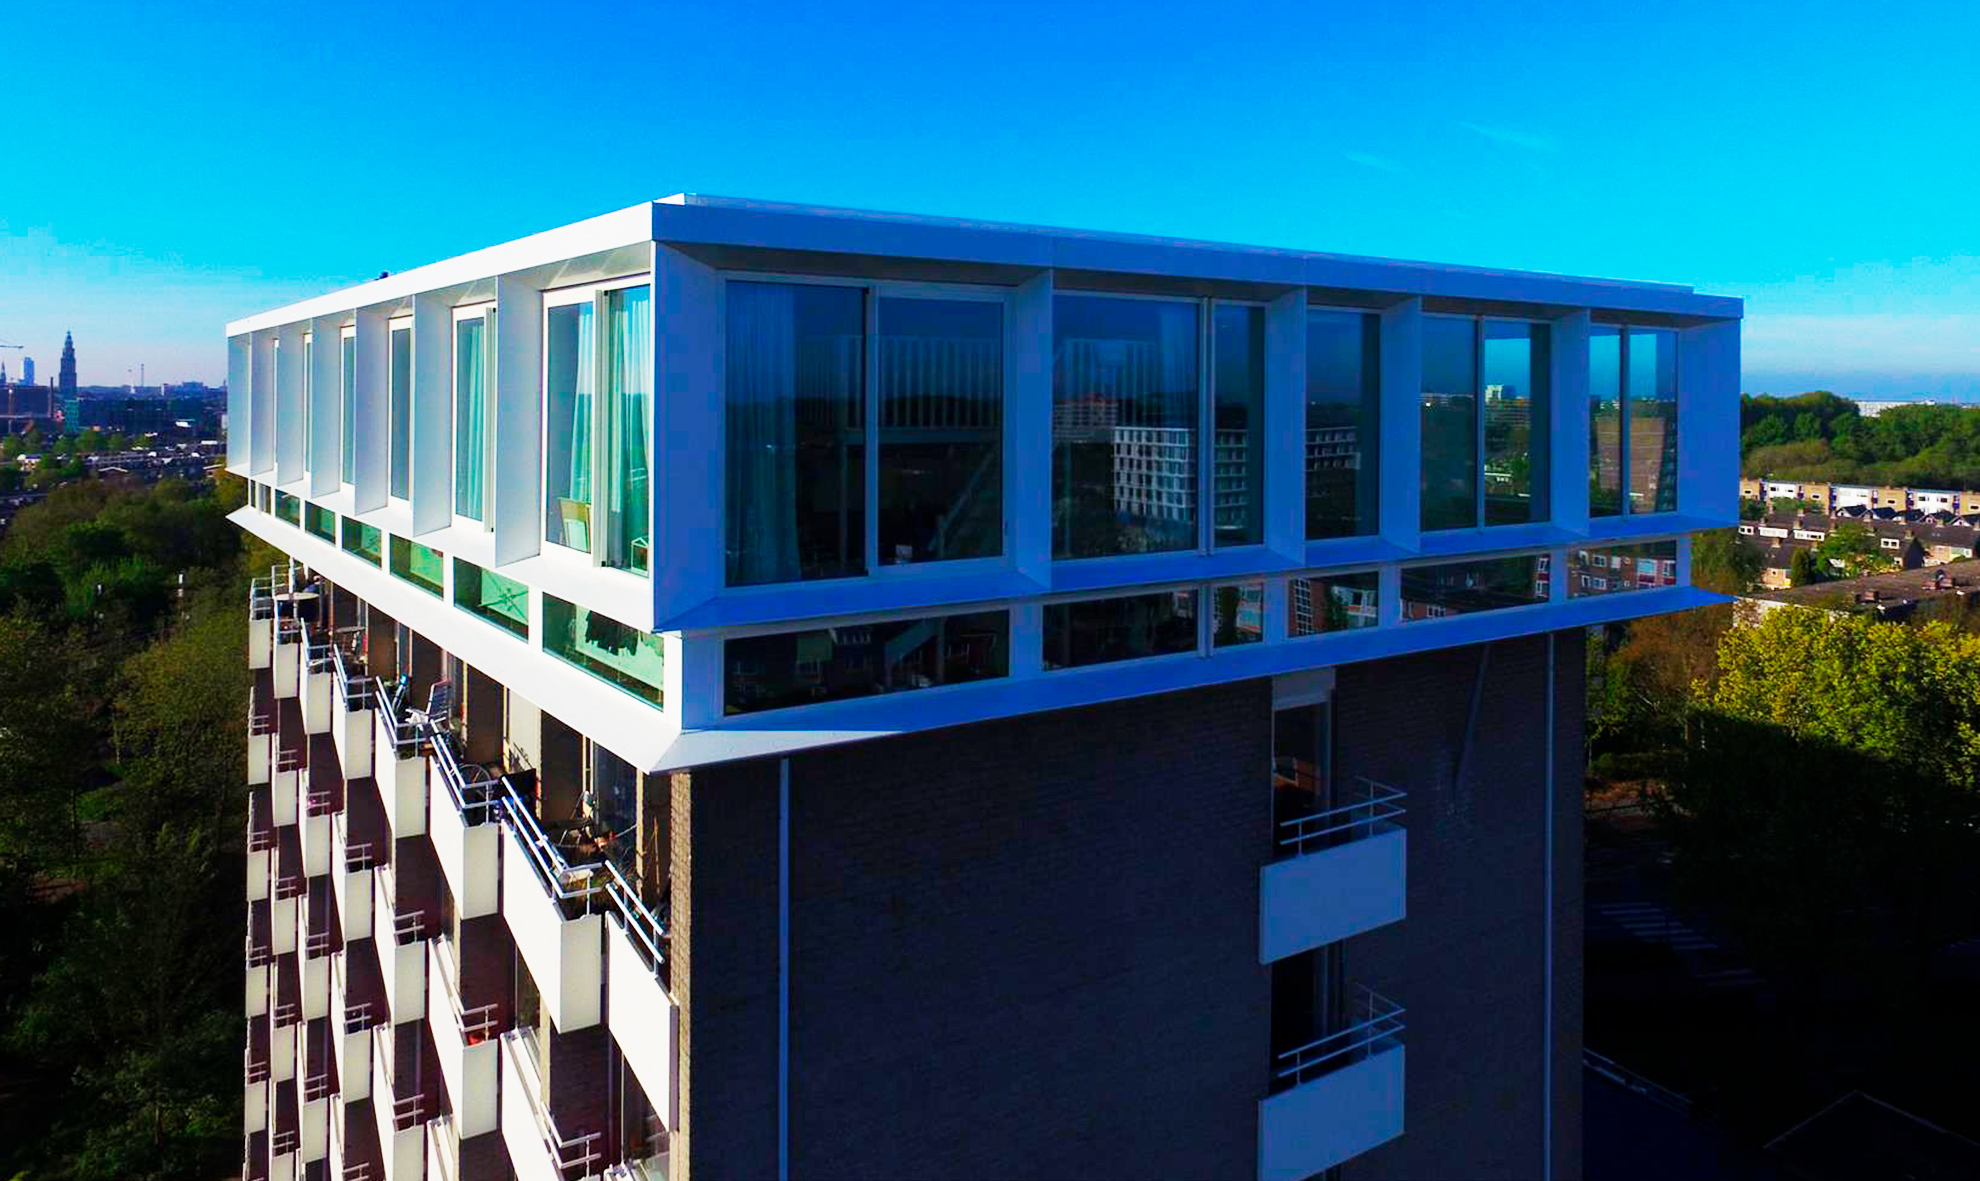 Edificio-Utopia.-Groningen-Holanda.-larson-4-mm-FR-Pure-White-6_1591026717.jpg